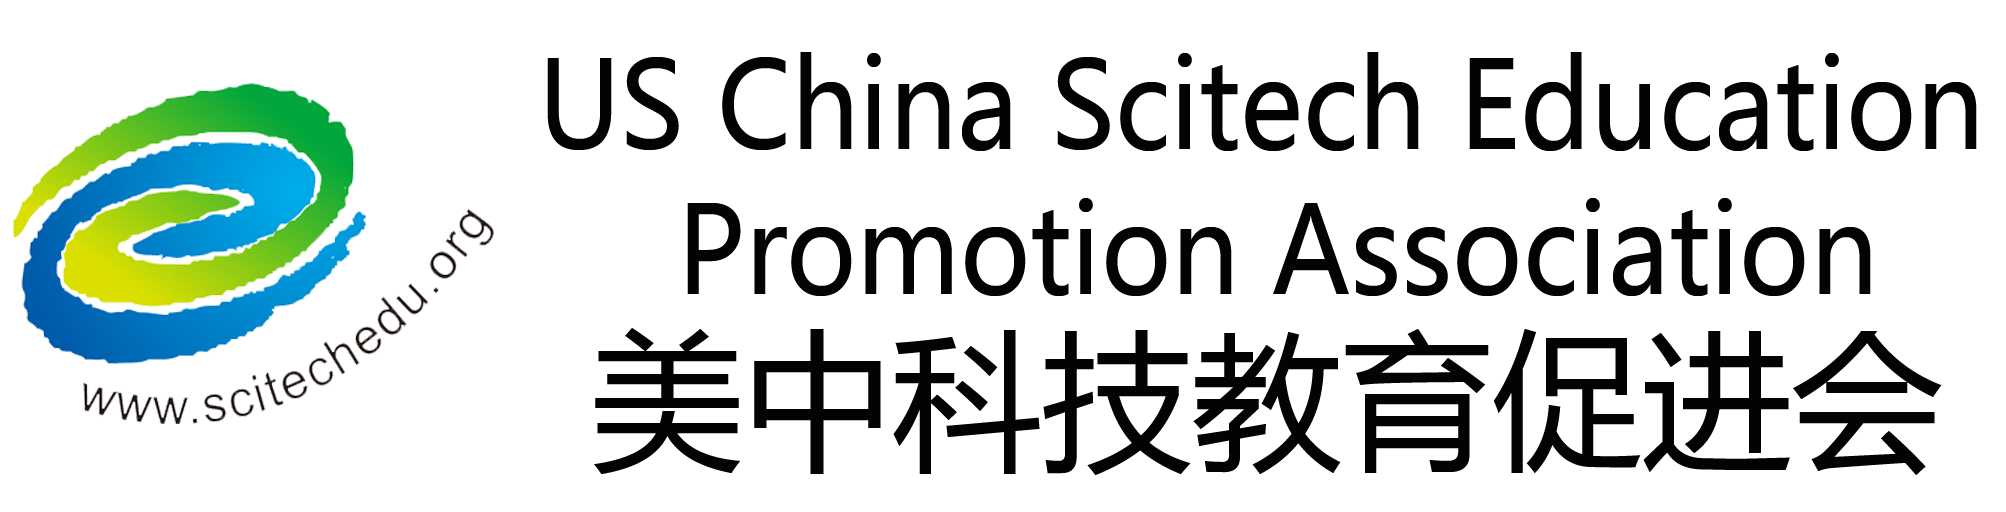 US China Scitech Education Promotion Association